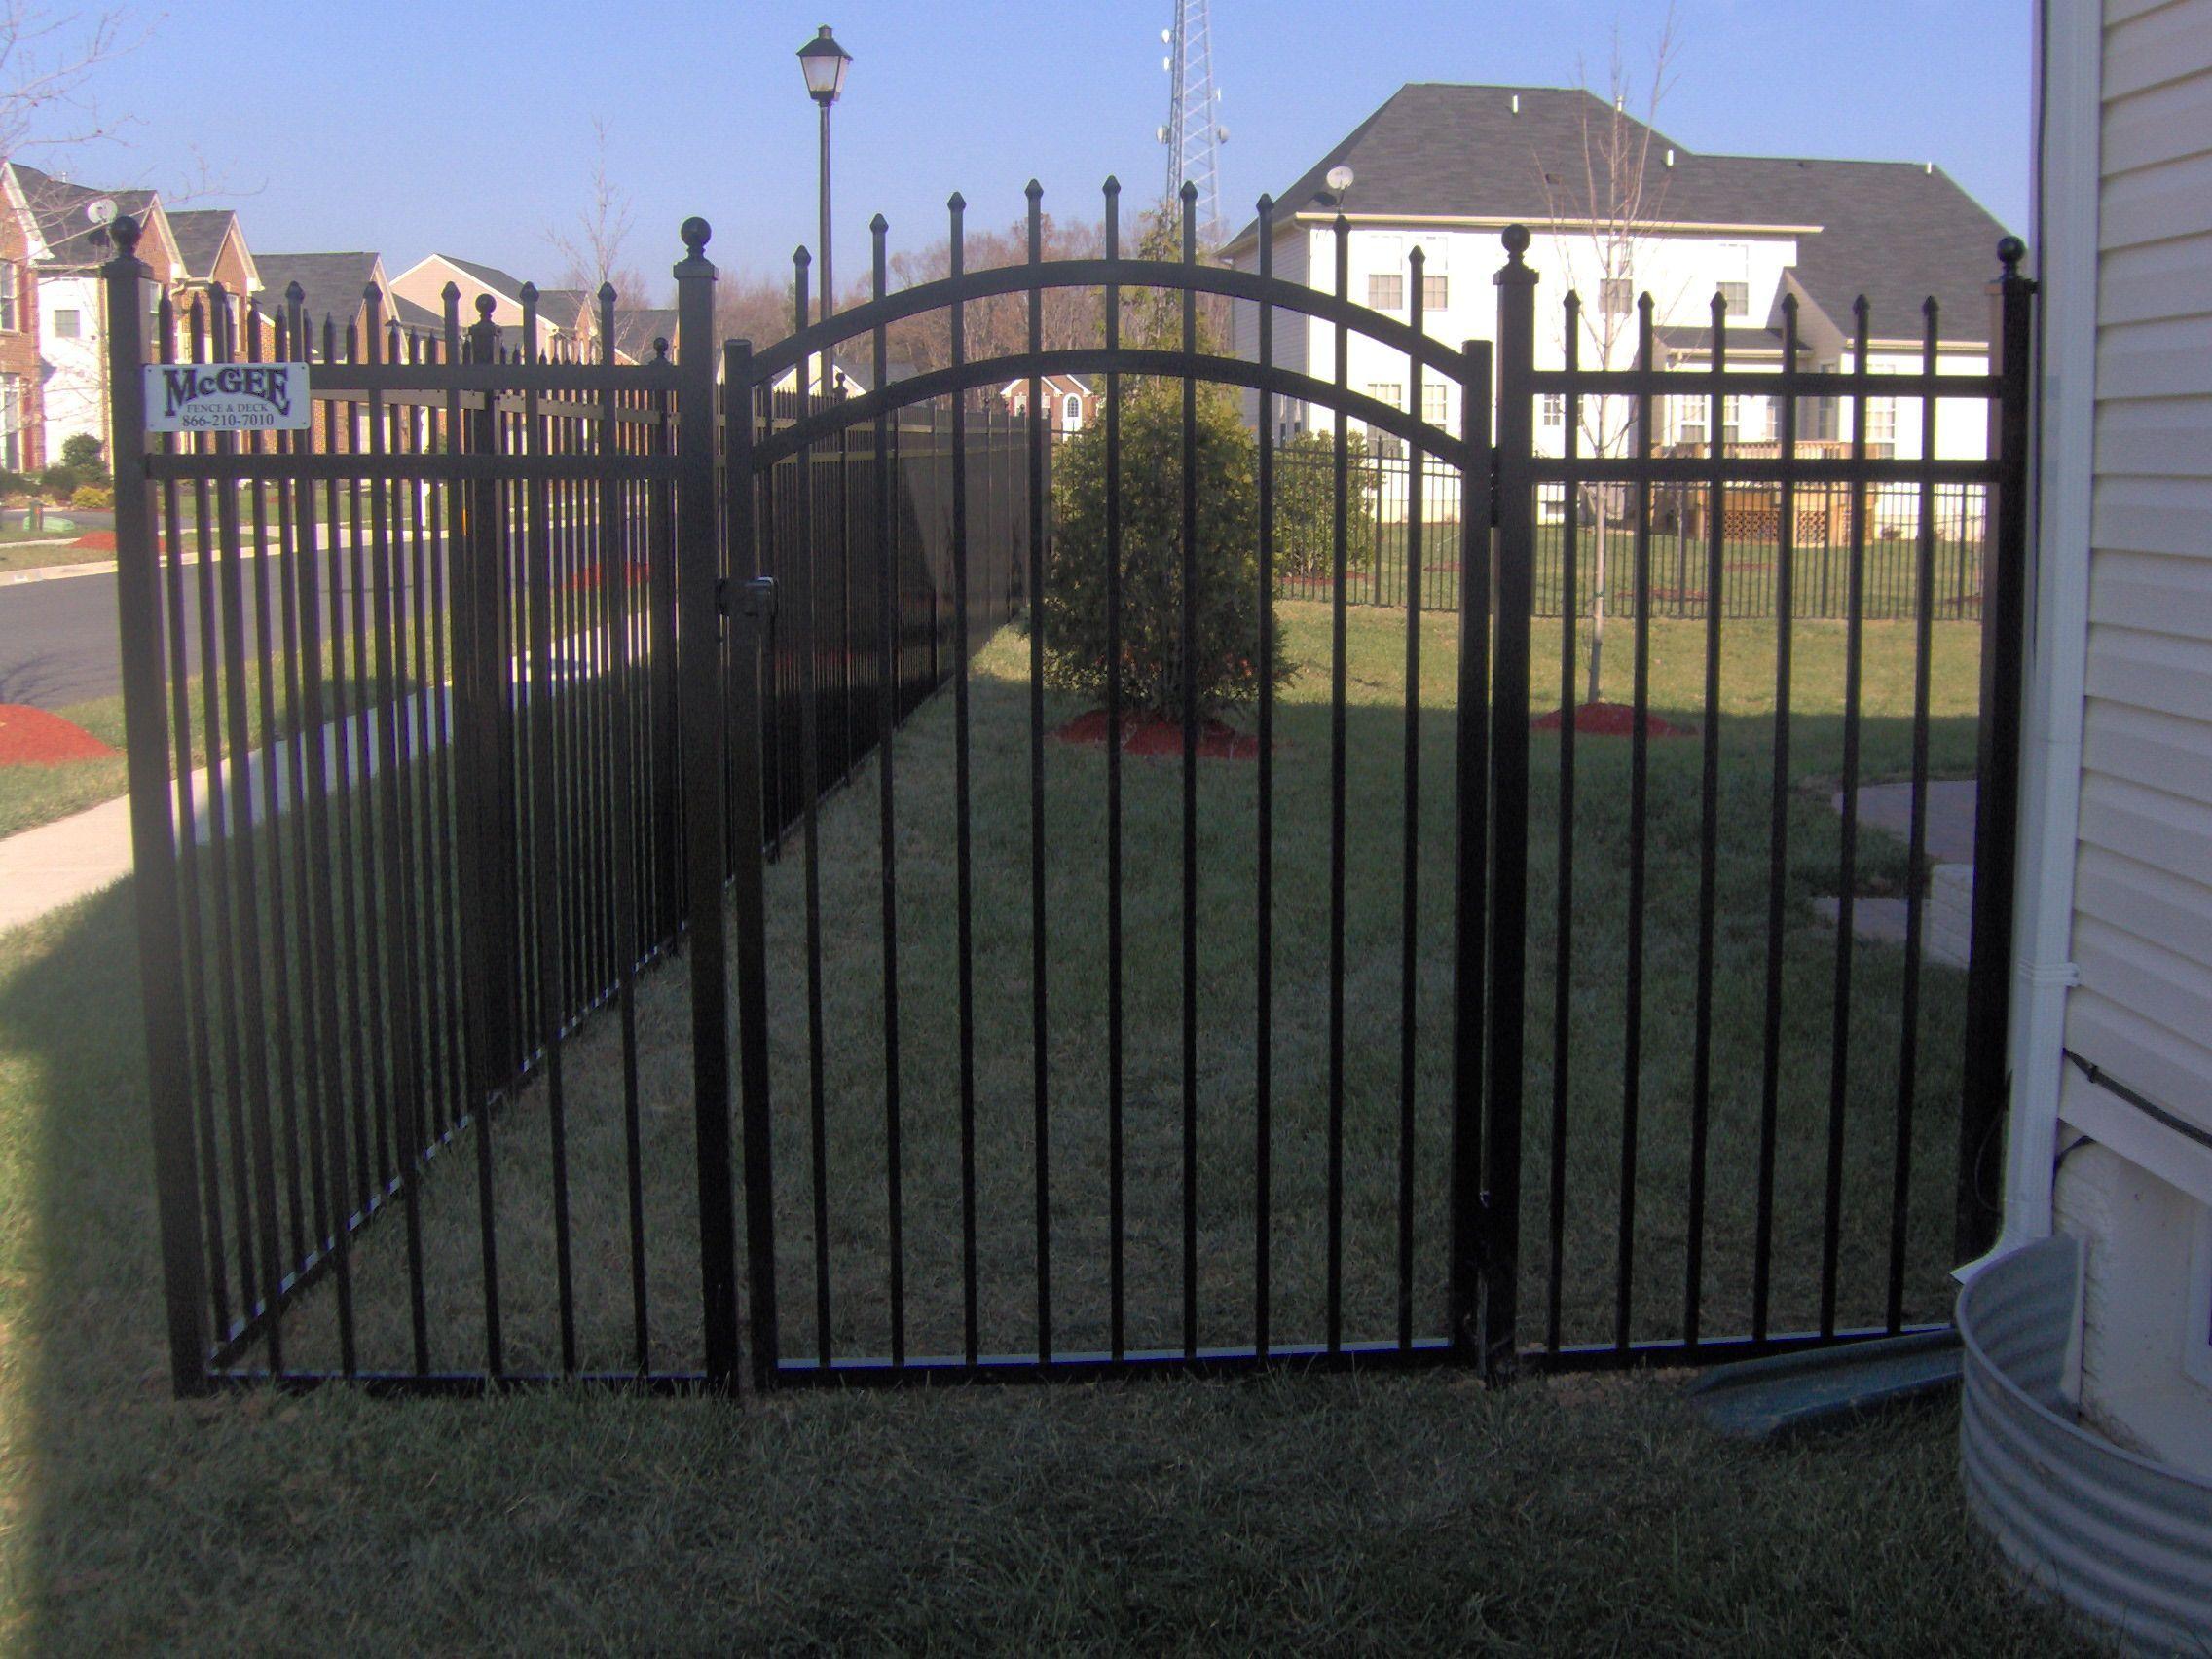 3 Fabulous Ideas Can Change Your Life Split Rail Fence Repair Cheap Fence Garden White Fence Panels Split Rail Fence Repair Living Privacy Fence